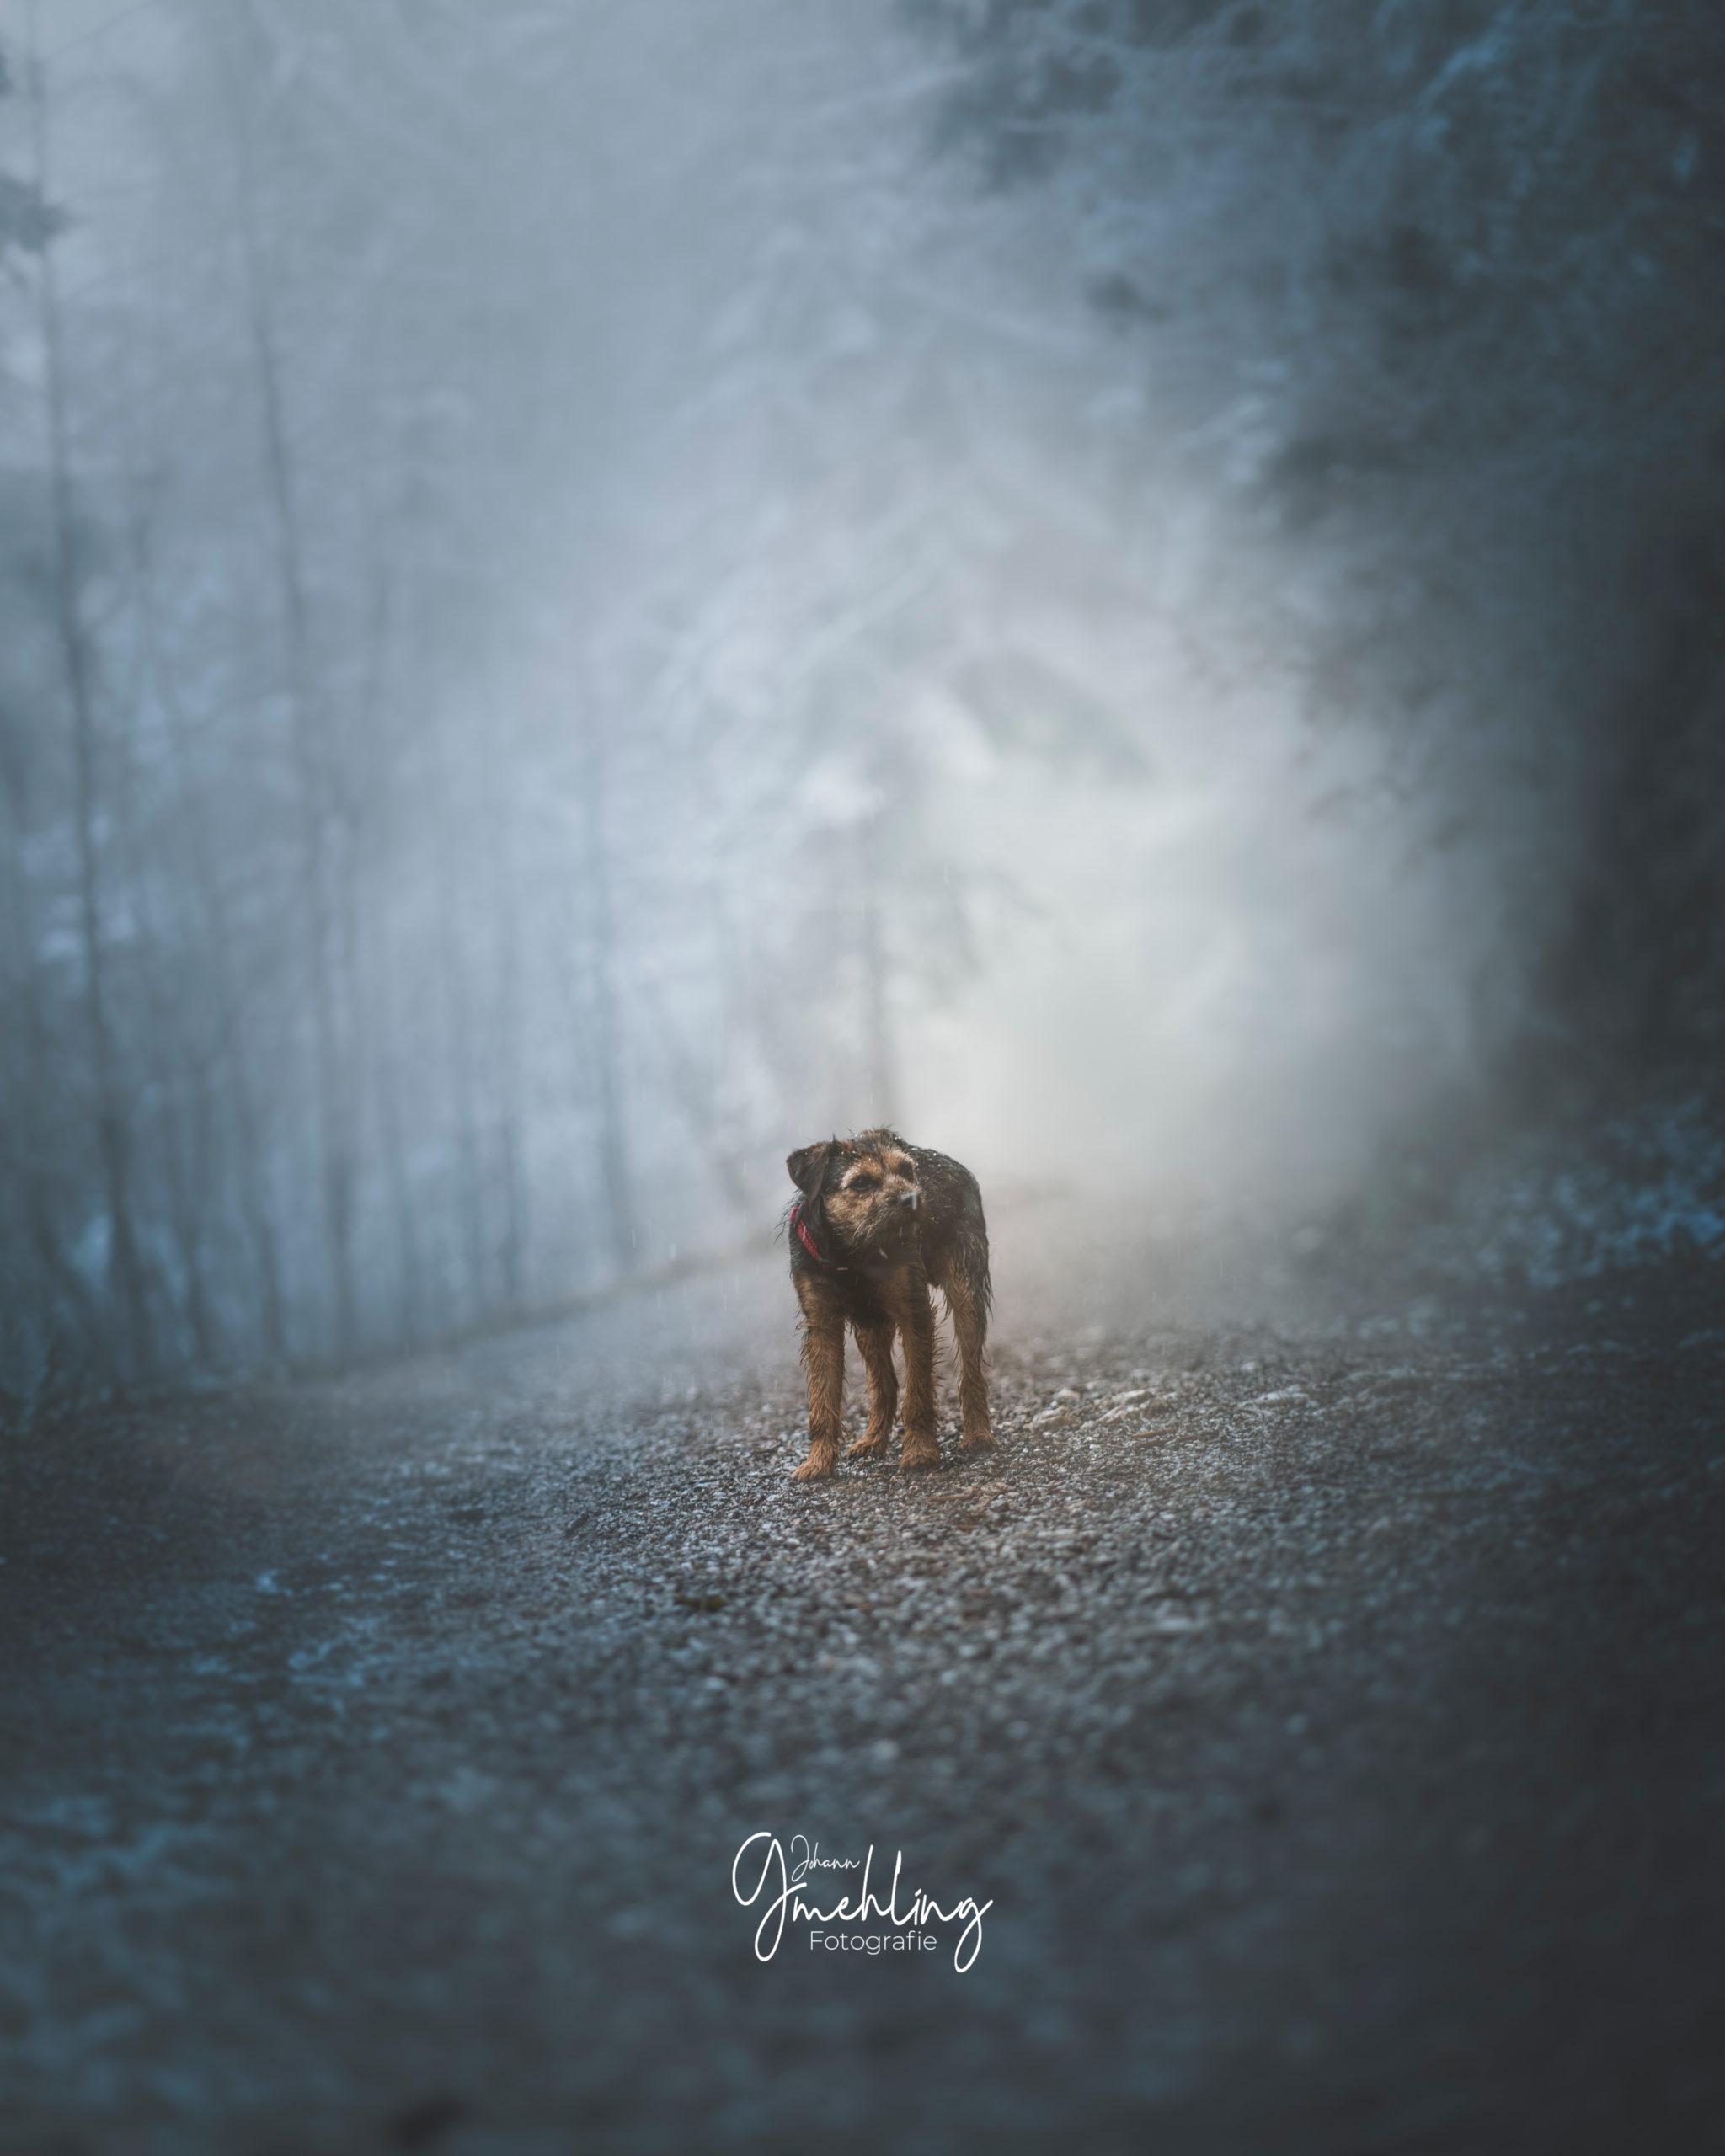 Hund steht im Nebelgrau